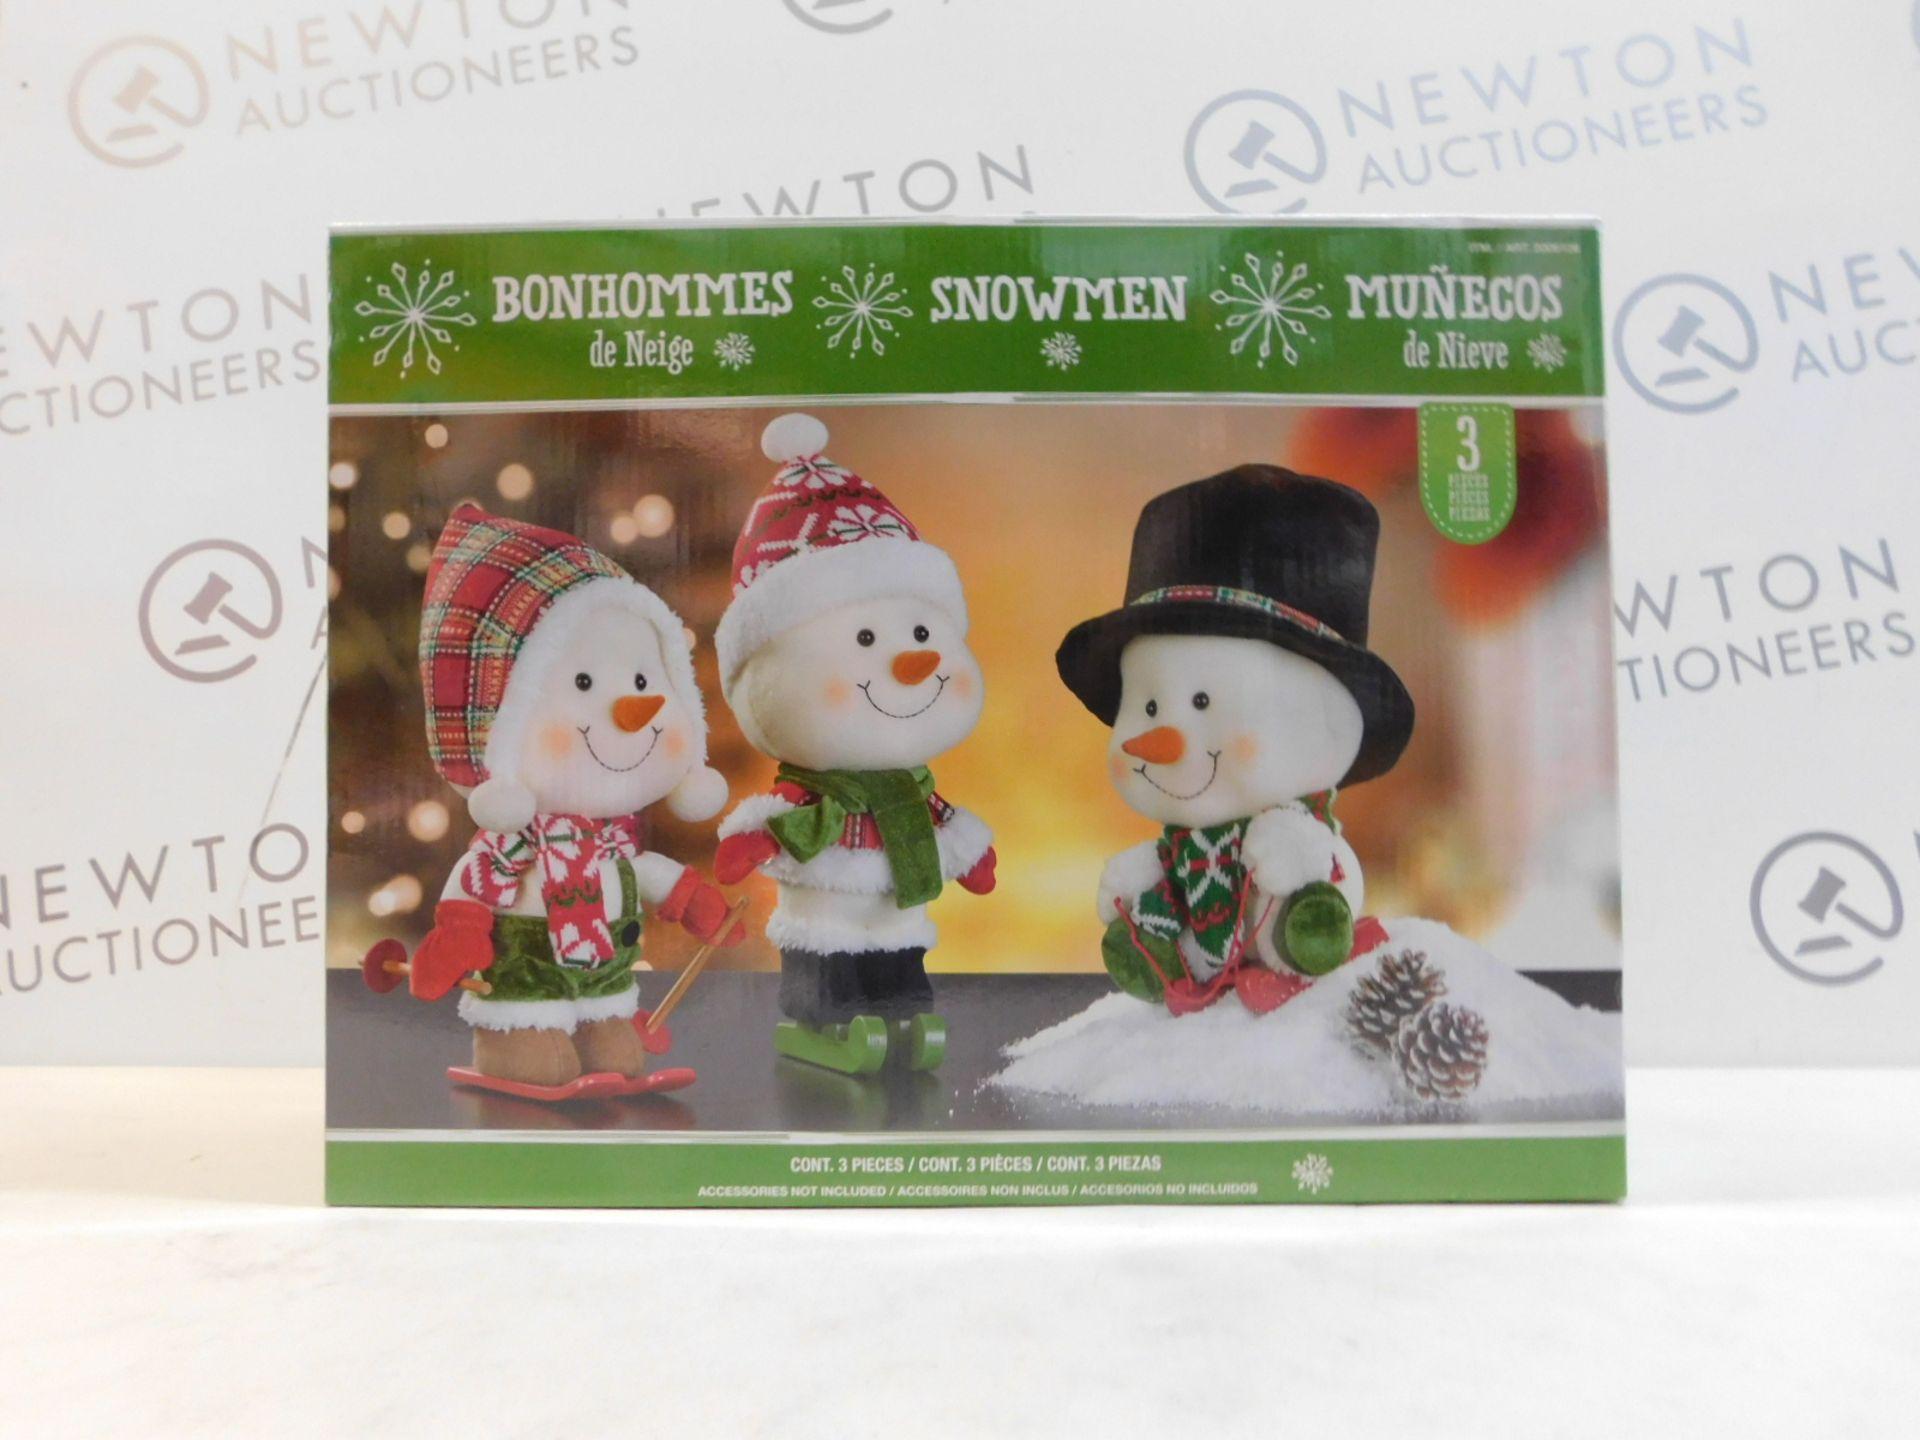 1 BOXED 12 INCH (30 CM) BIG HEAD PLUSH CHRISTMAS SNOWMEN FIGURES - SET OF 3 RRP £39